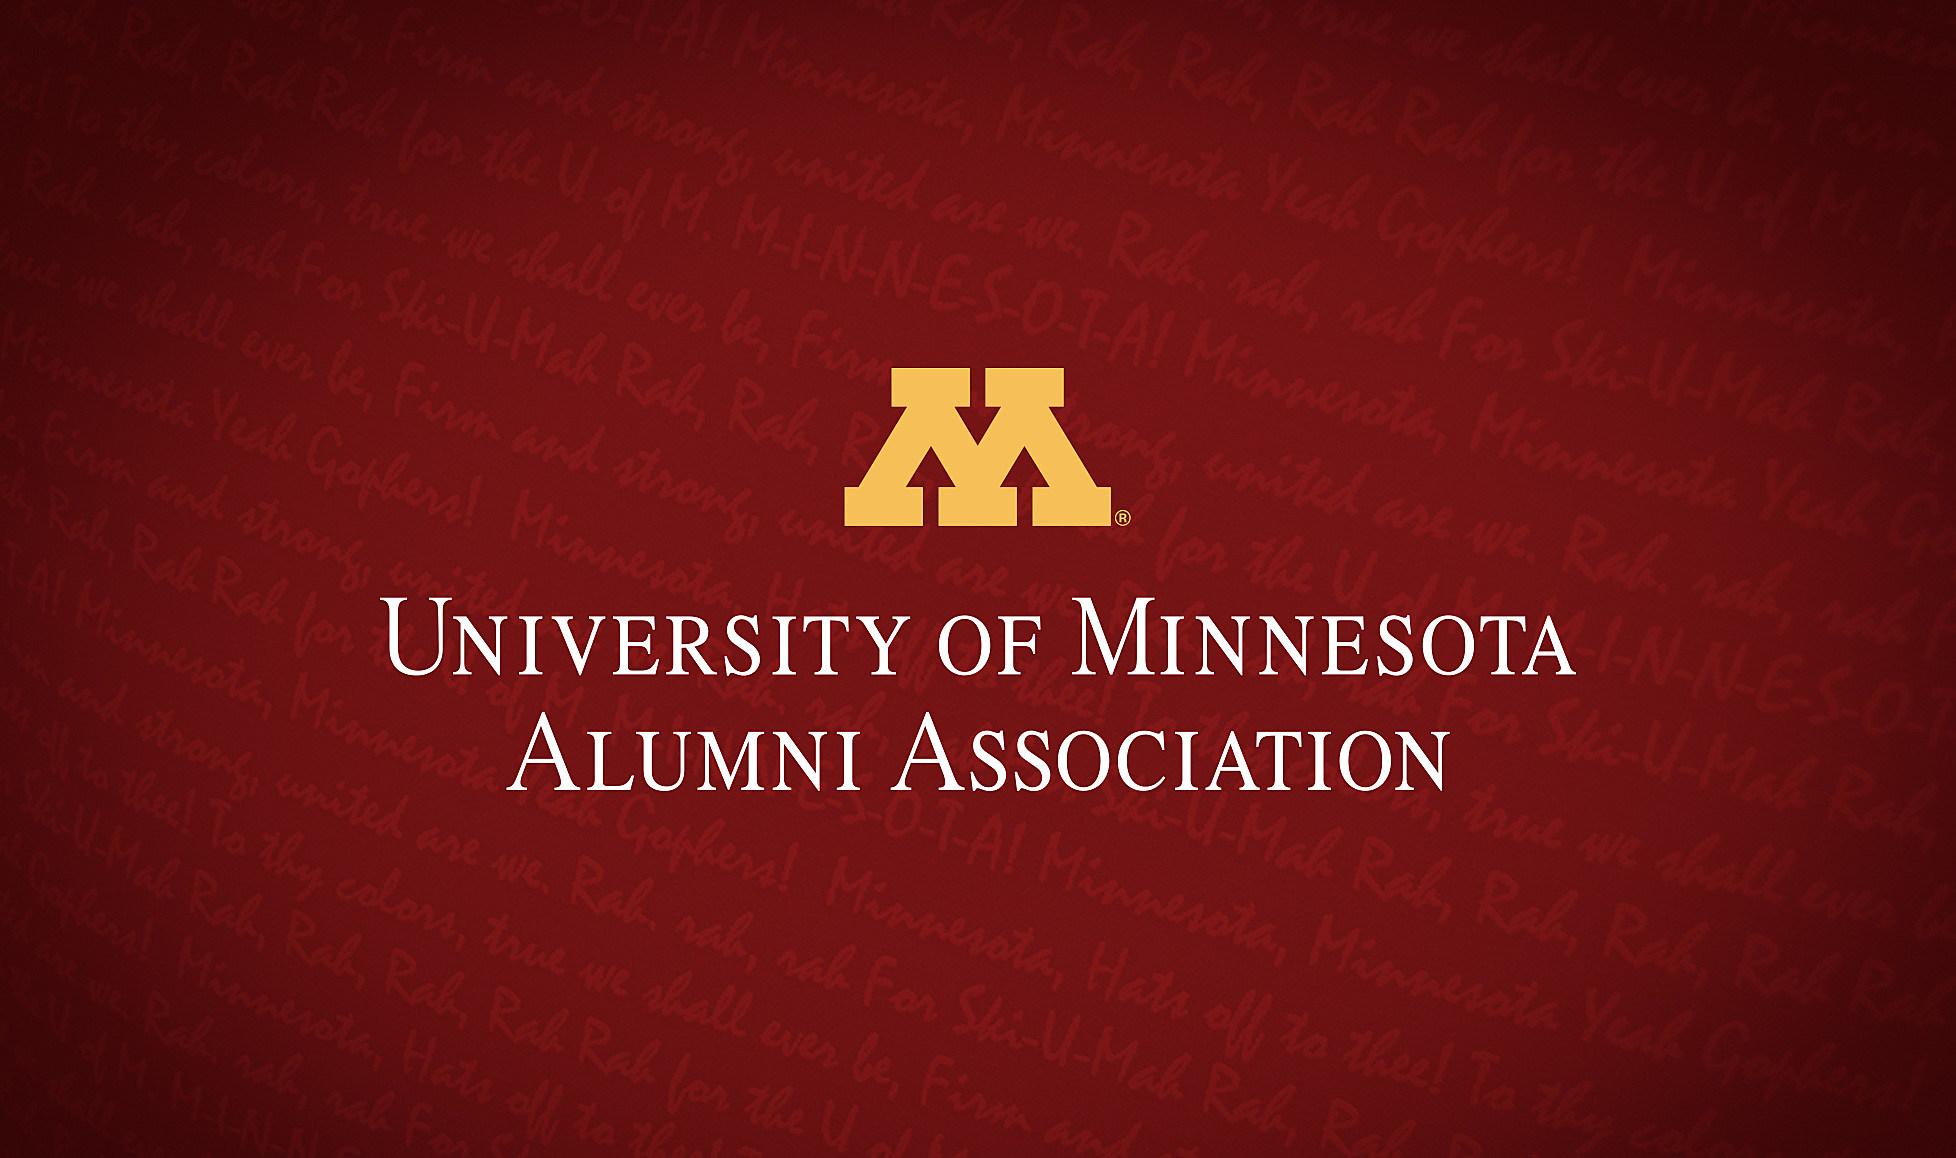 UMN Alumni Assoc. Selling and Donating Maroon & Gold Face Masks